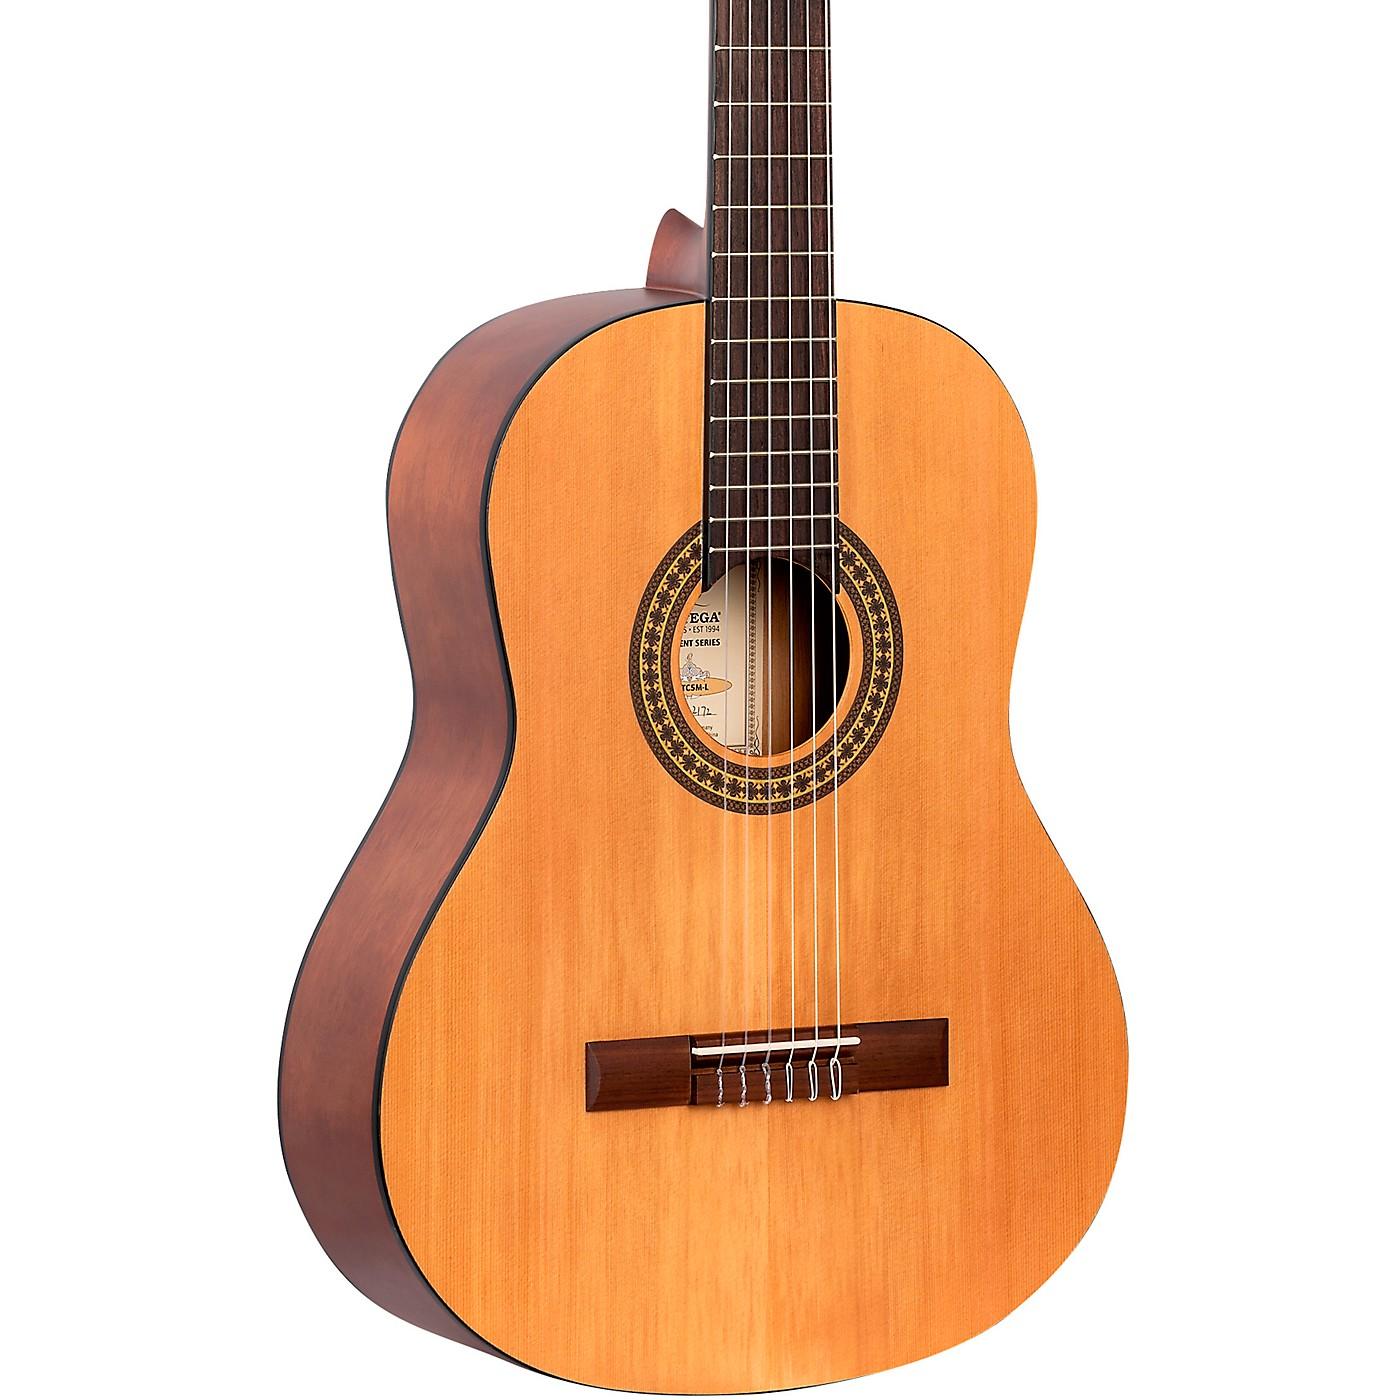 Ortega RST5CM-L Student Series Full-Size Acoustic Classical Guitar thumbnail